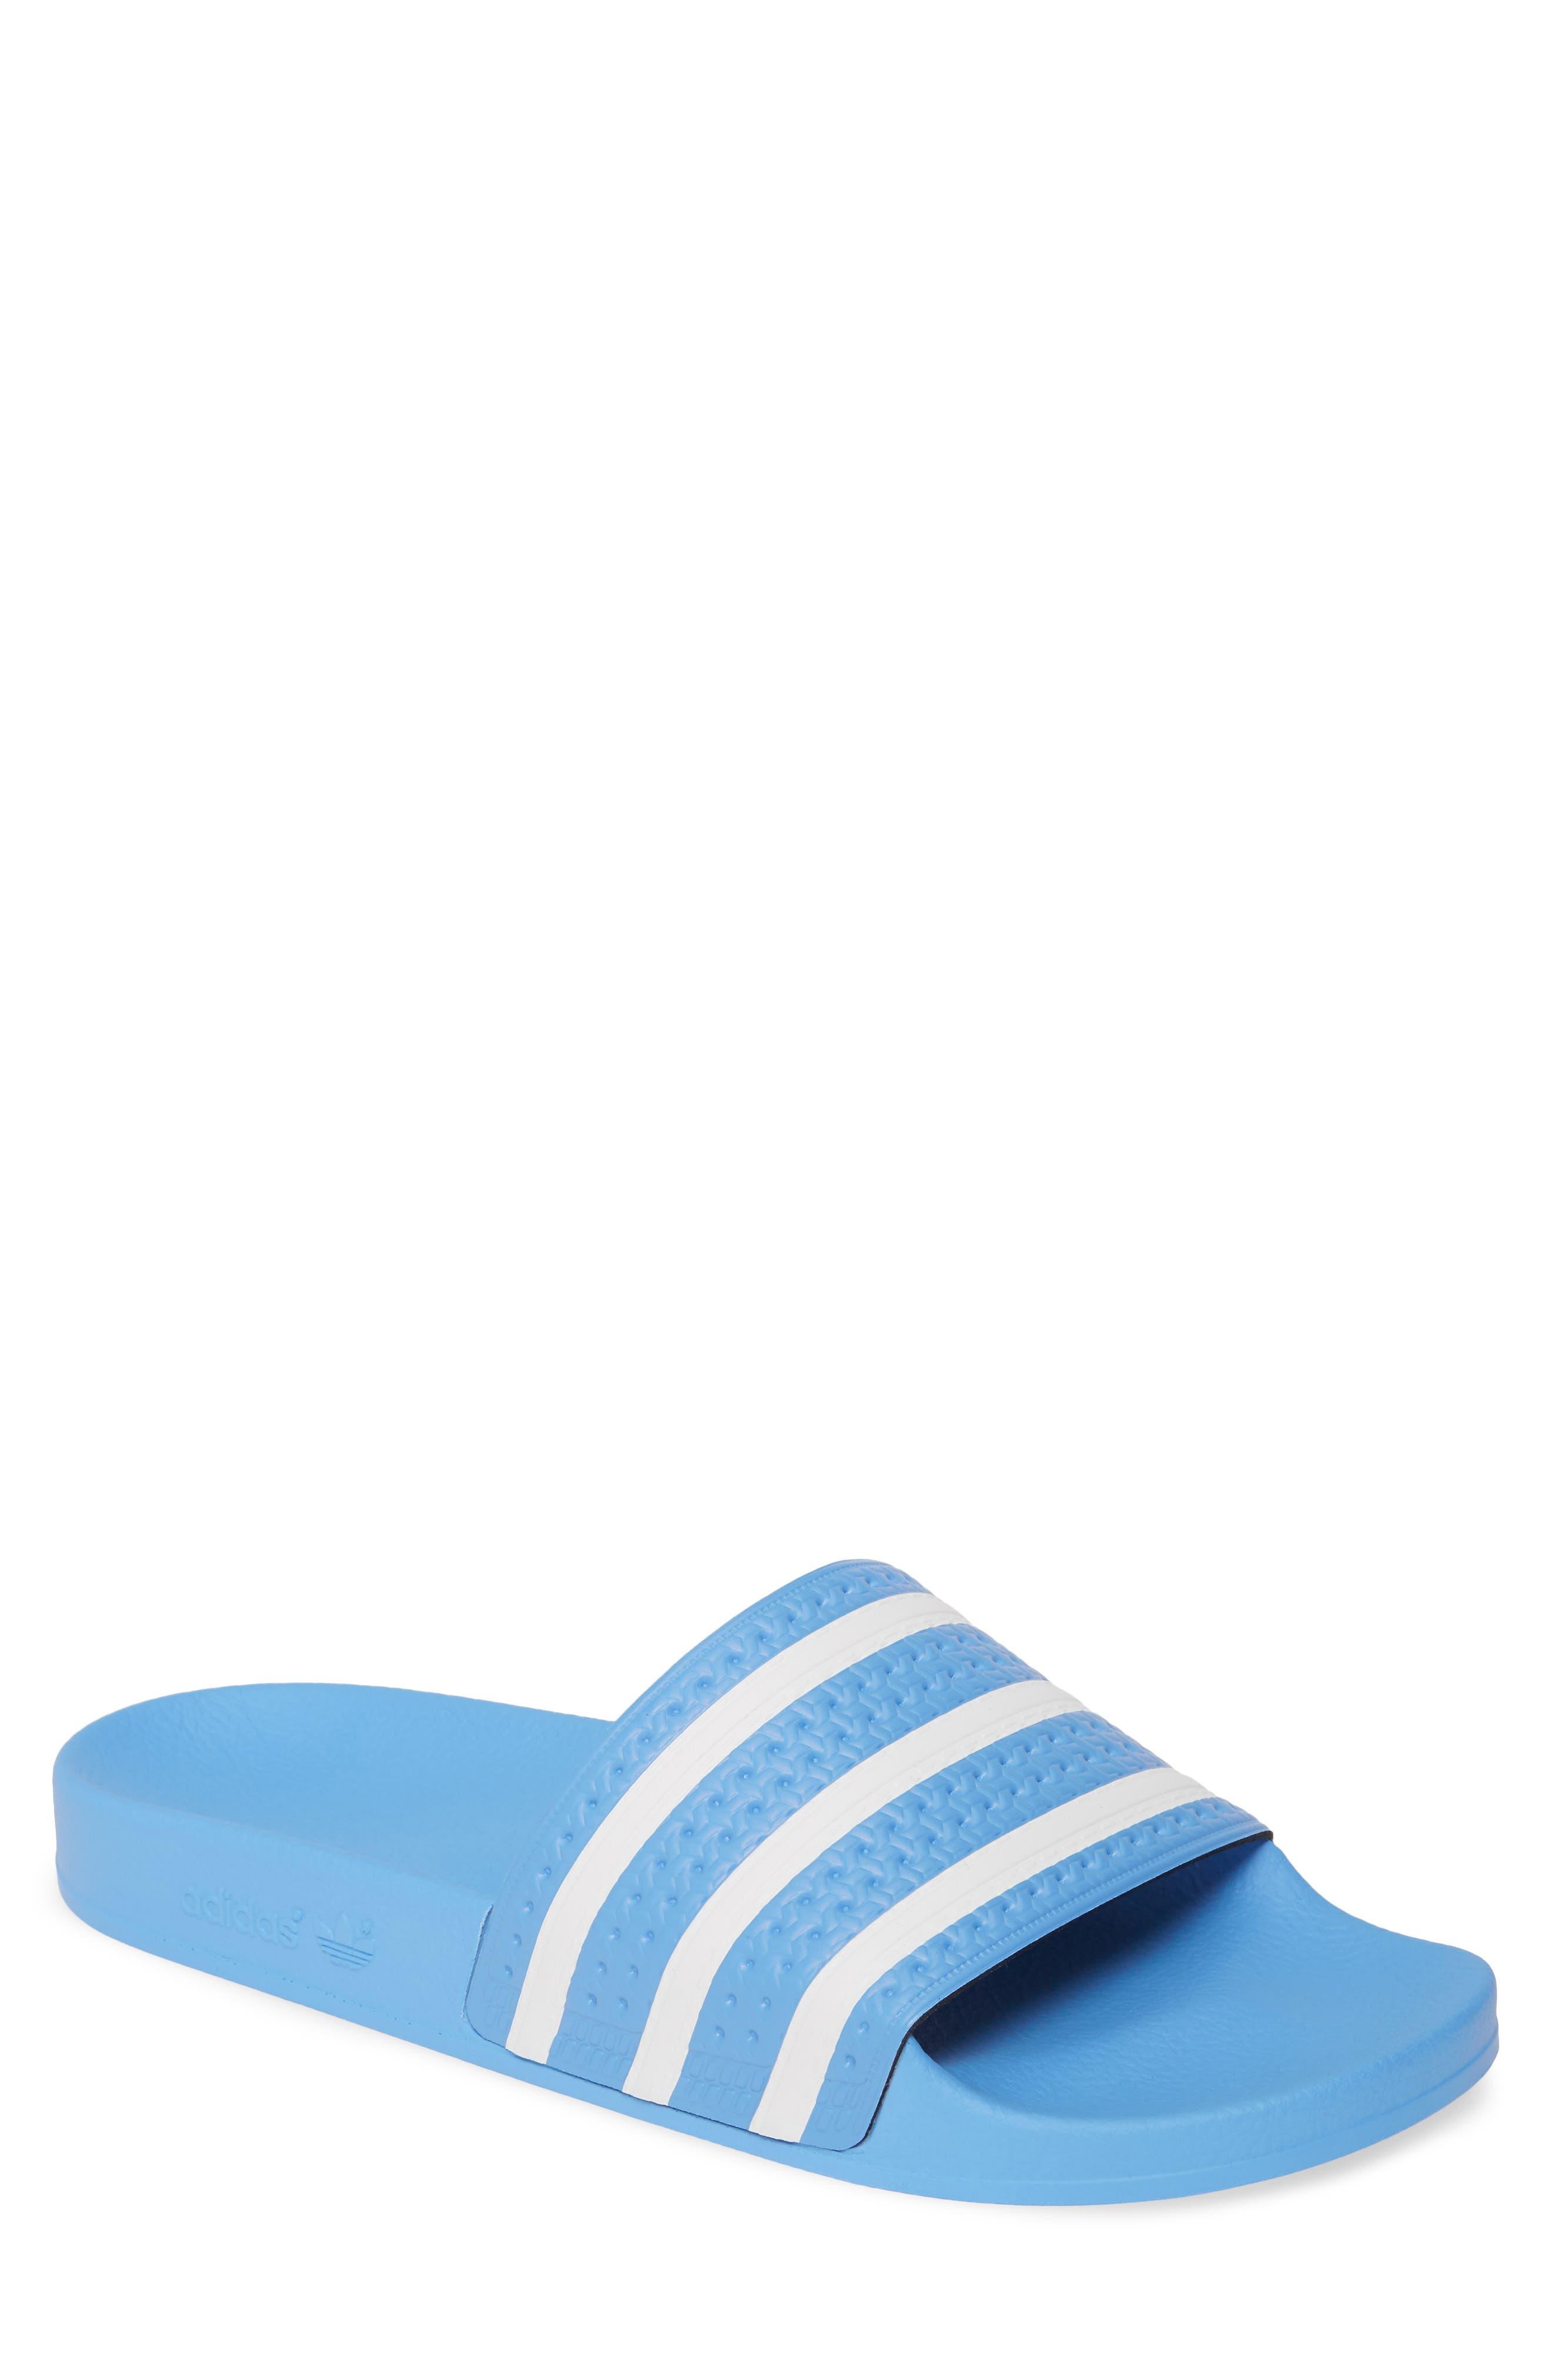 9e9916783363d Adidas | Nordstrom